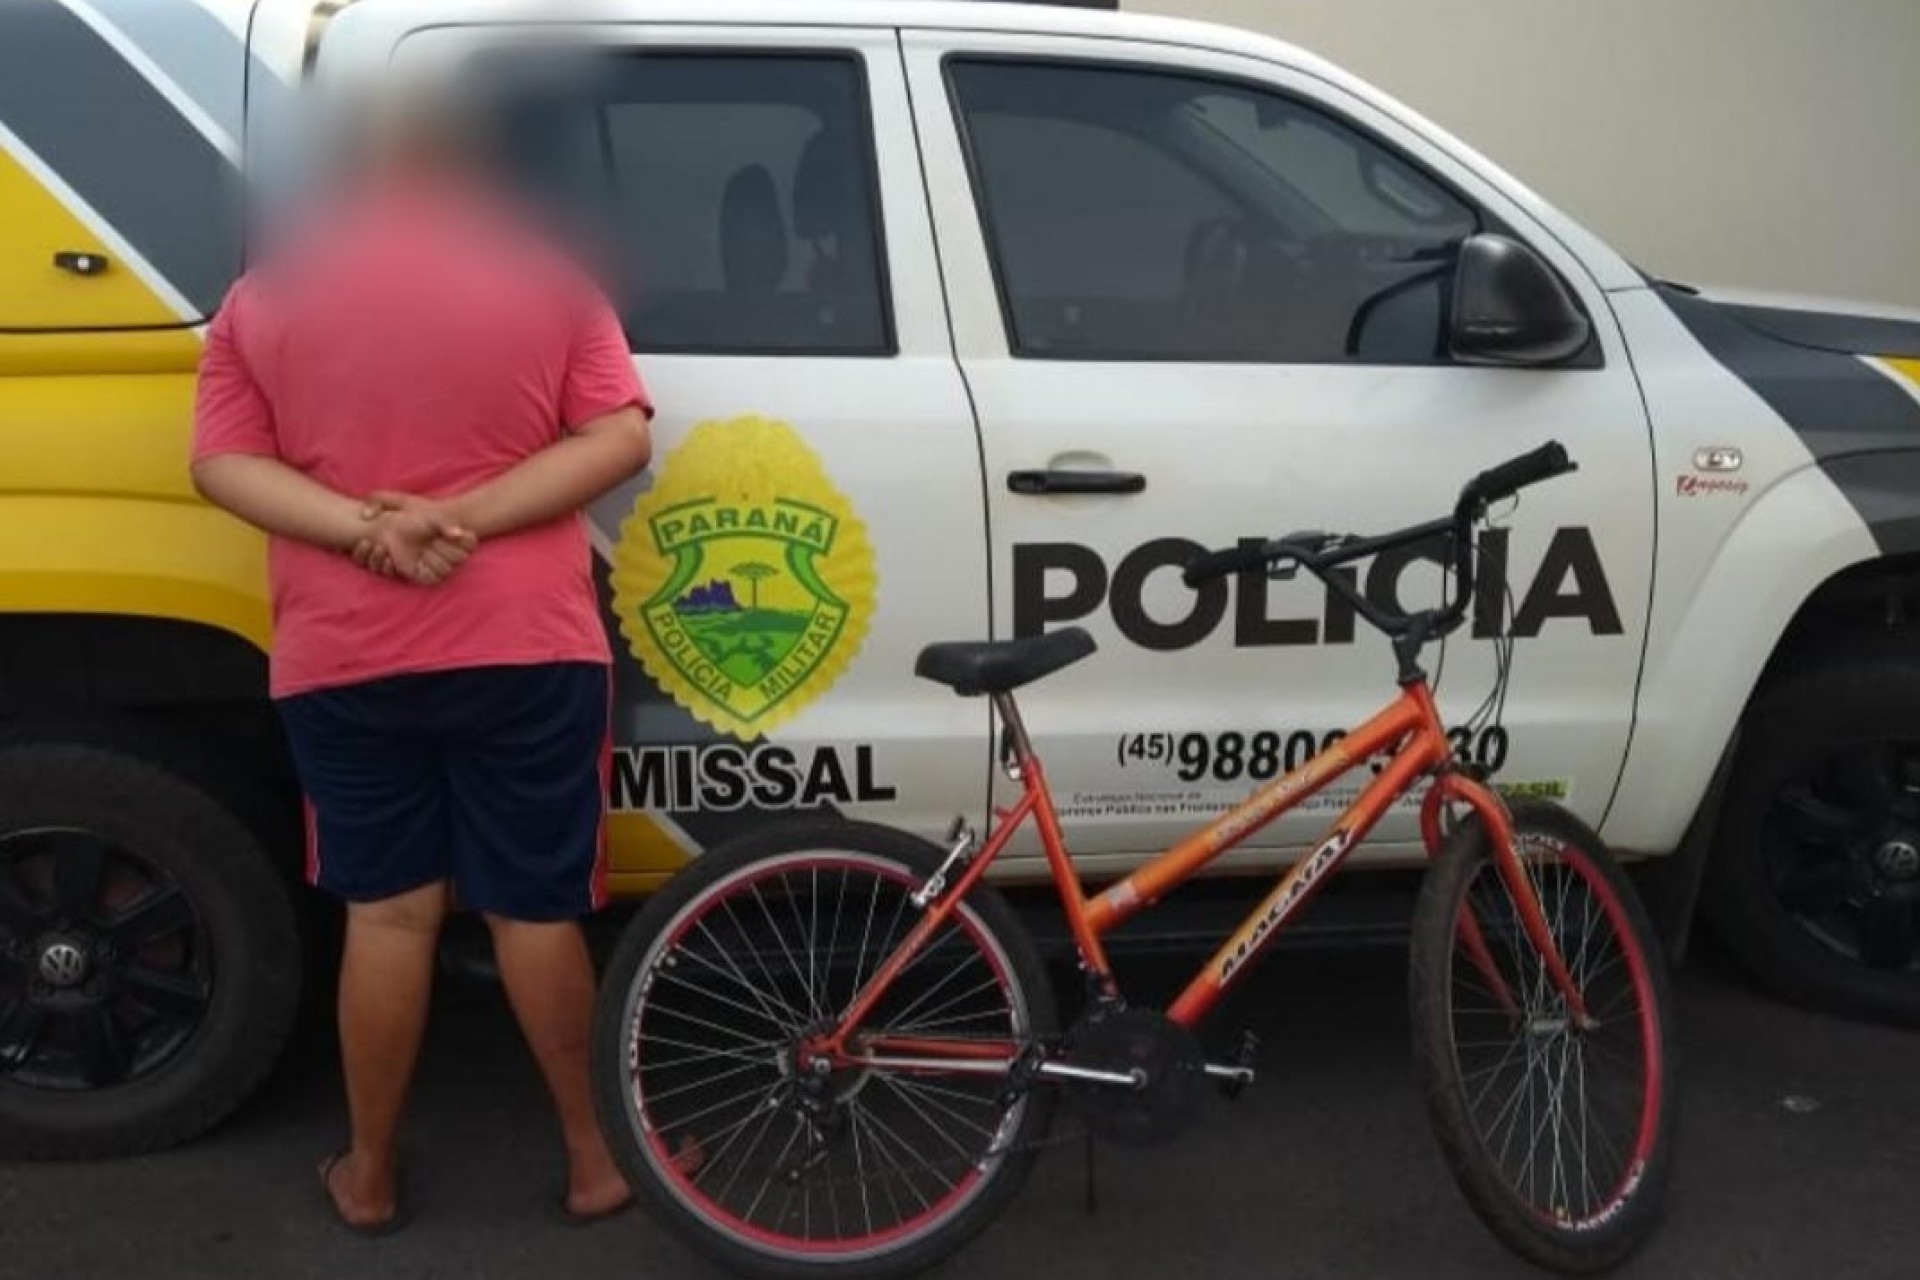 Polícia Militar de Missal recupera bicicleta furtada e apreende menor